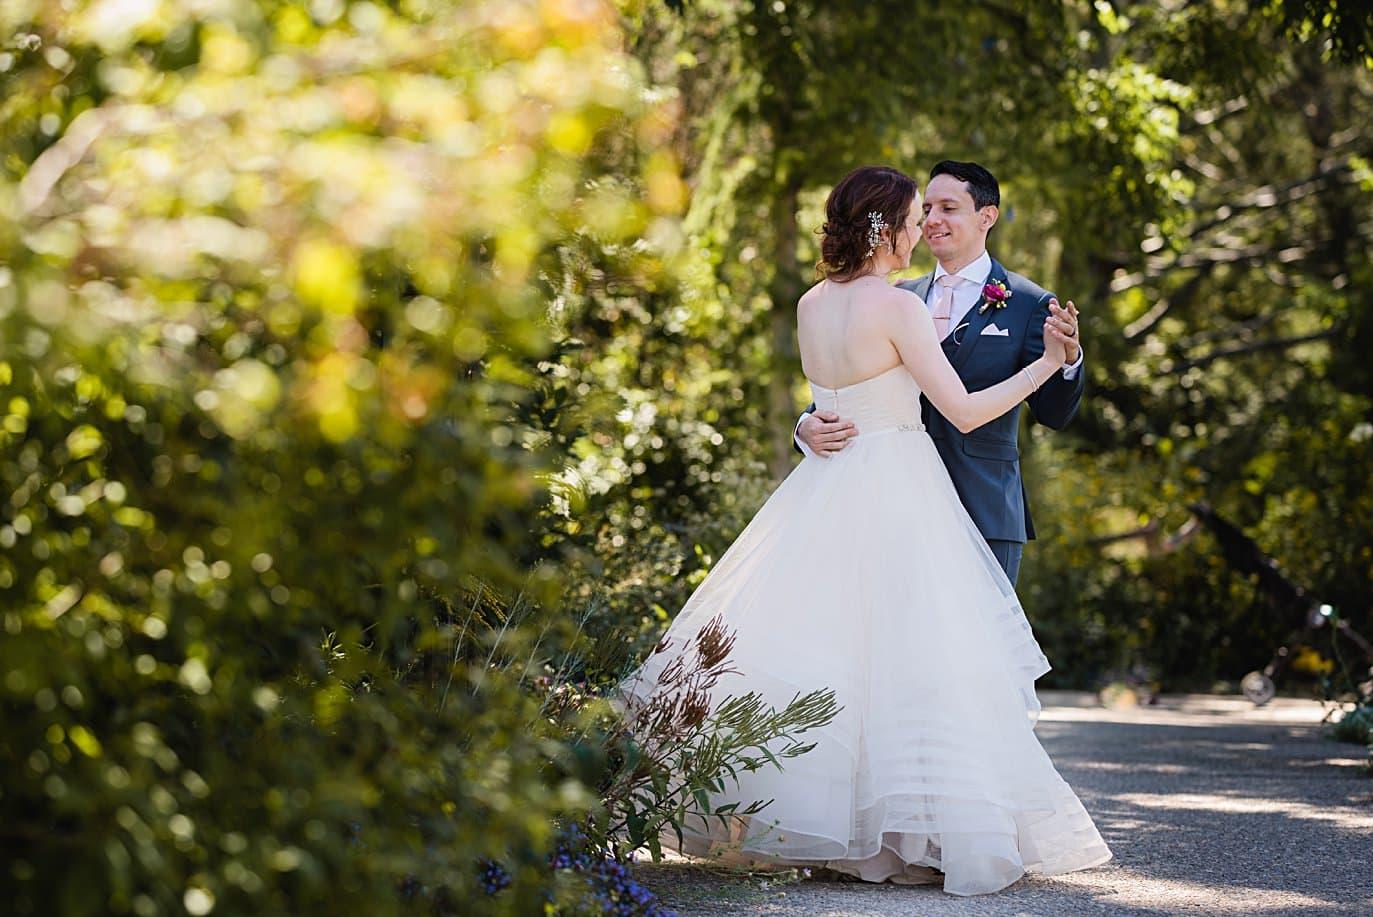 bride and groom practice first dance at Denver Botanic Gardens microwedding by Boulder wedding photographer Jennie Crate